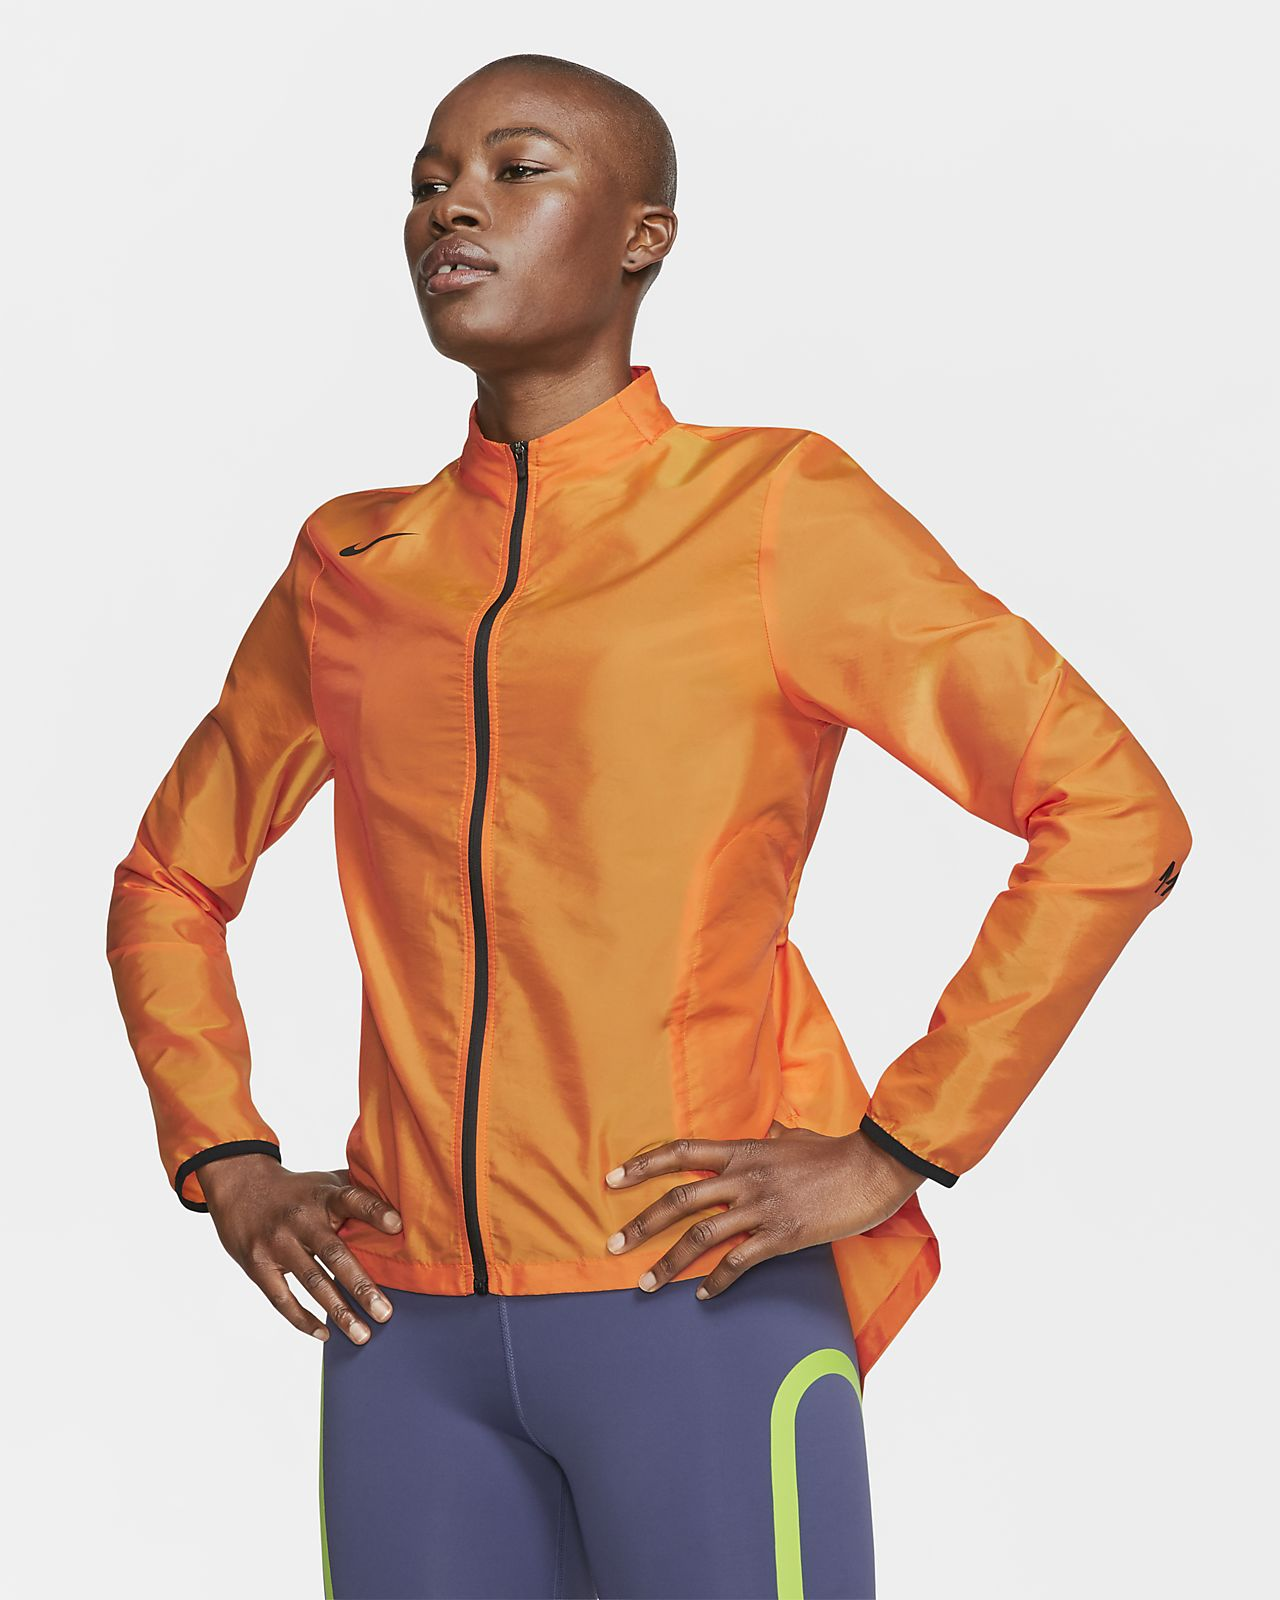 Nike Women's Full-Zip Running Jacket